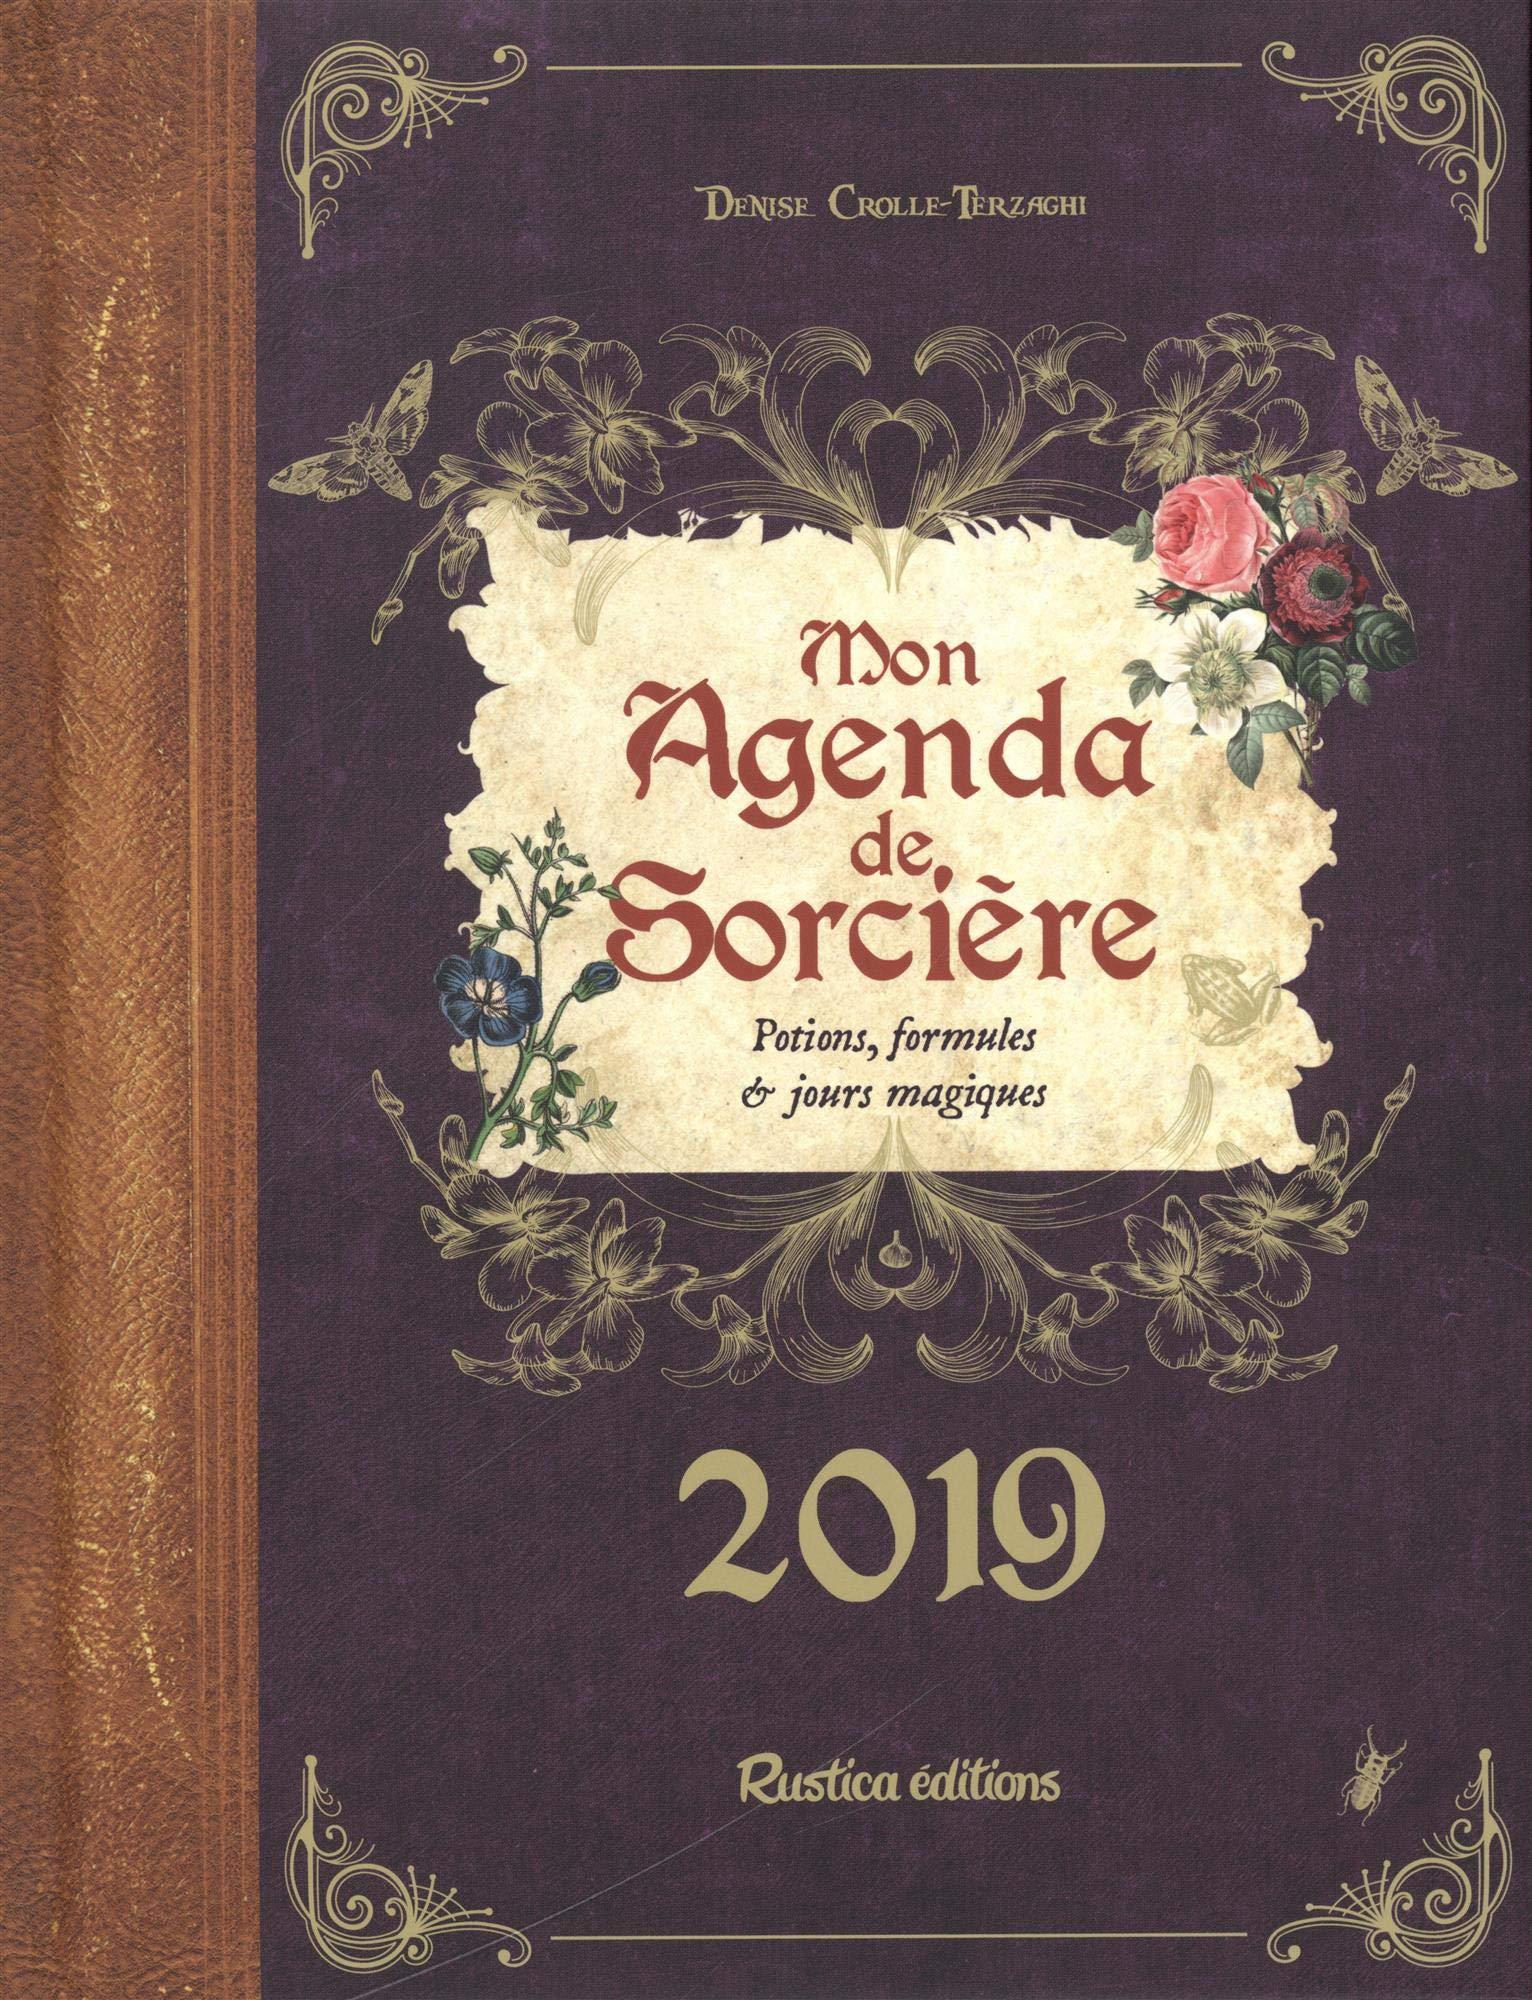 Calendrier Lunaire Septembre 2020 Rustica.Amazon Fr Mon Agenda De Sorciere 2019 Denise Crolle